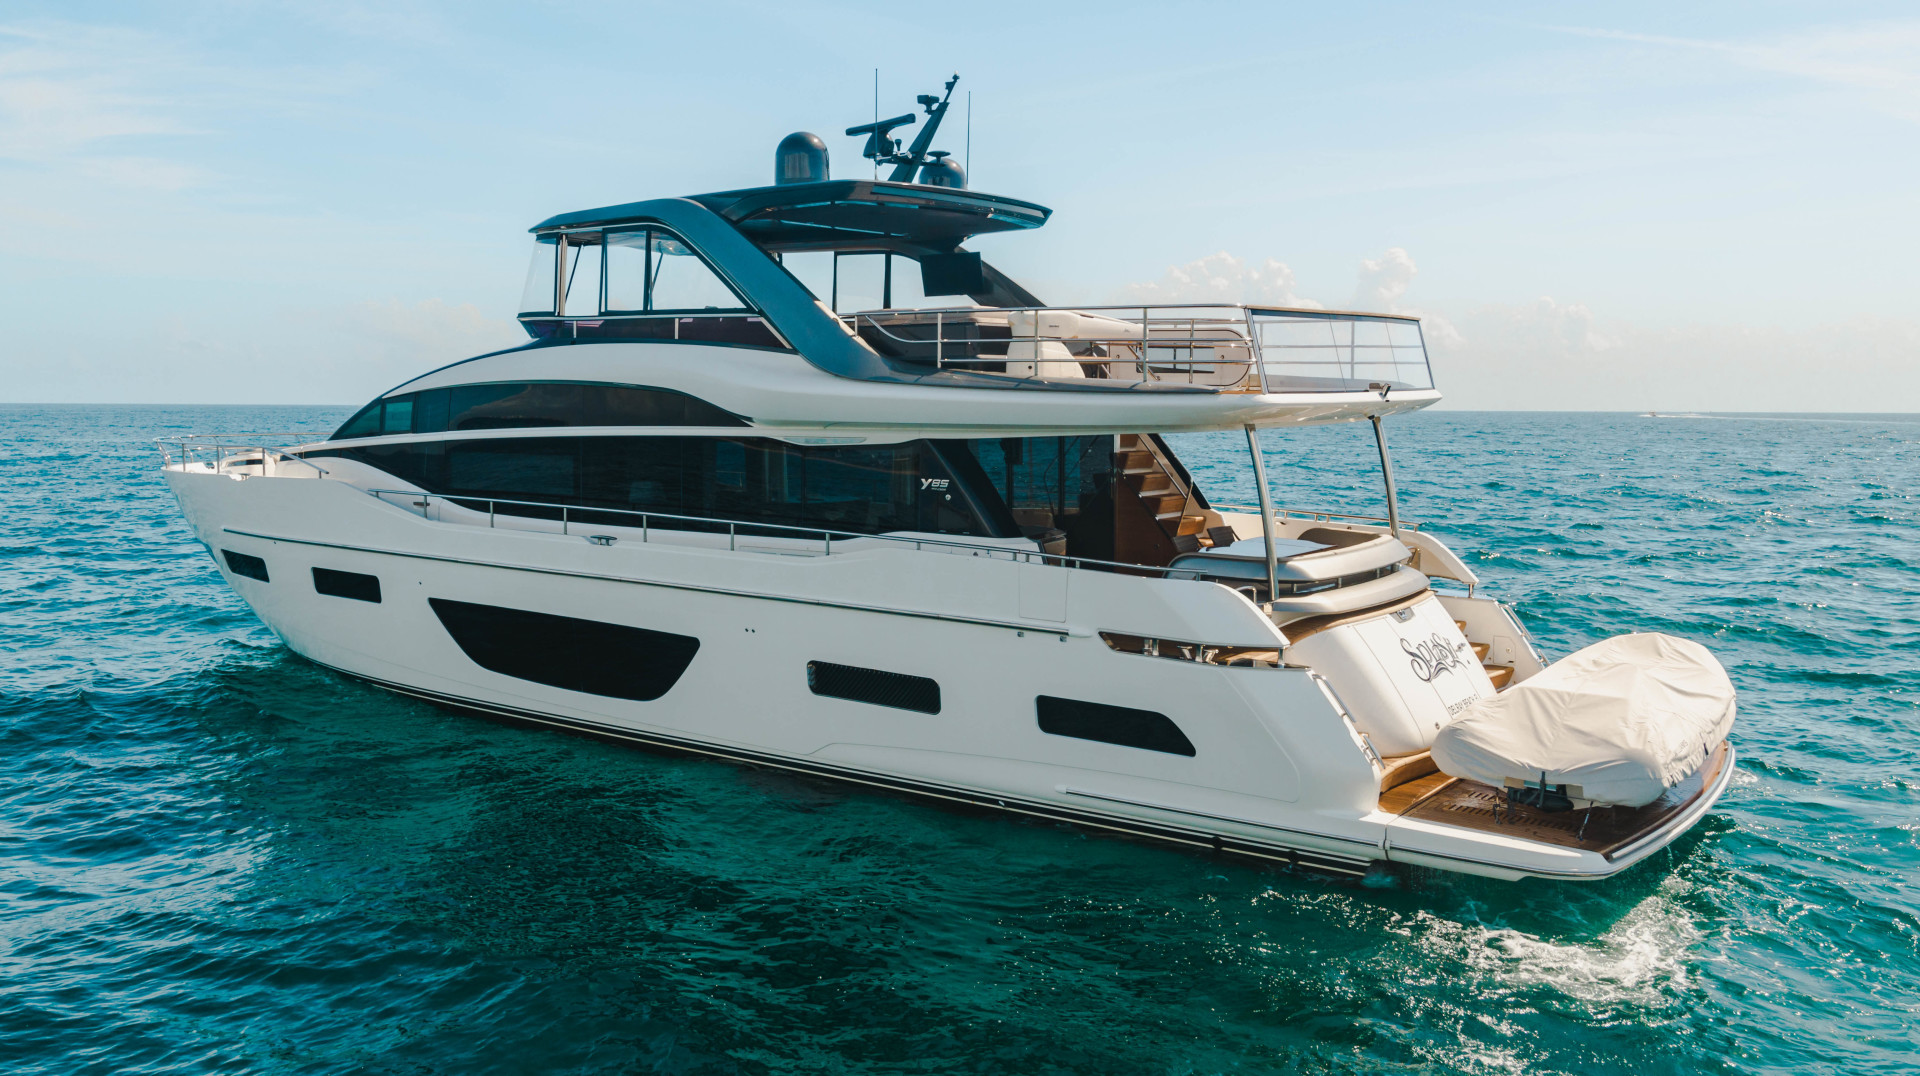 Princess-Y85  2019-Splash Delray Beach-Florida-United States-1631584 | Thumbnail